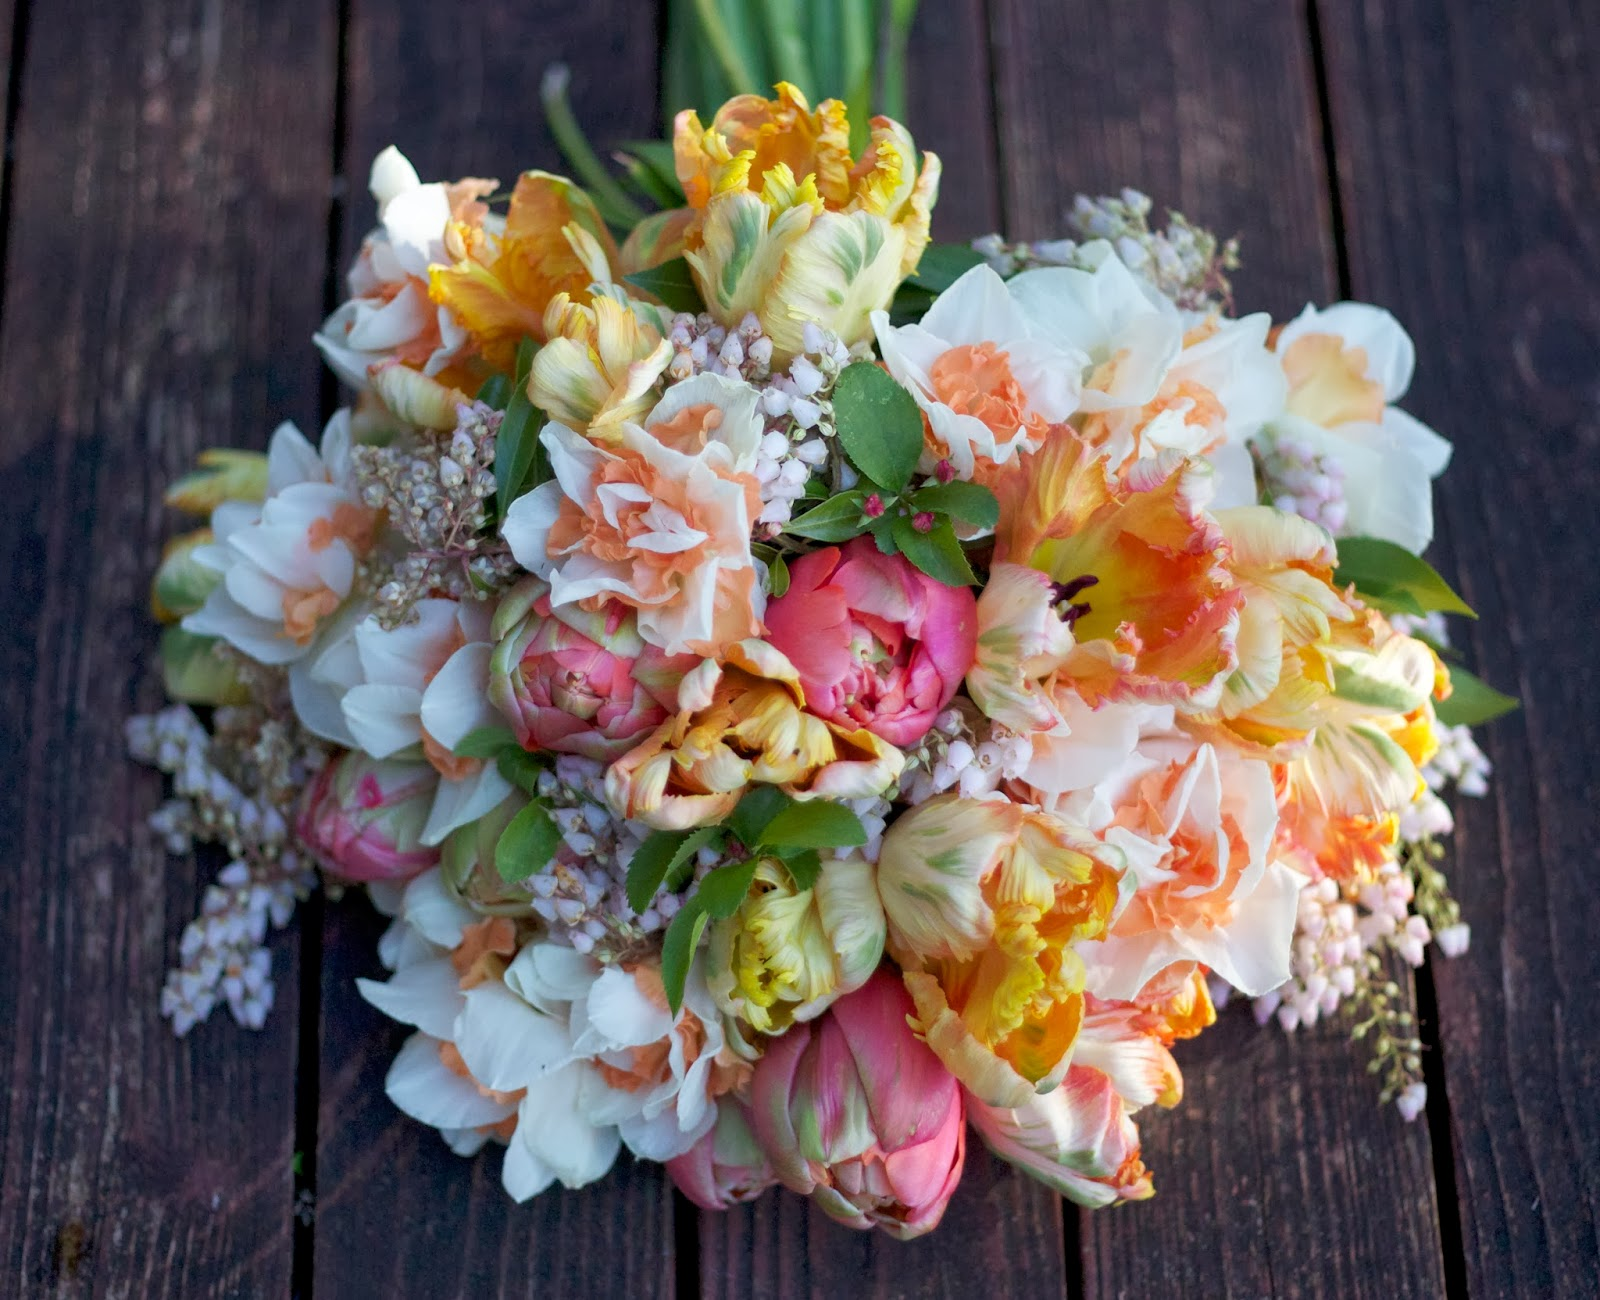 Fiori designs flowers for weddings in washington seattle everett